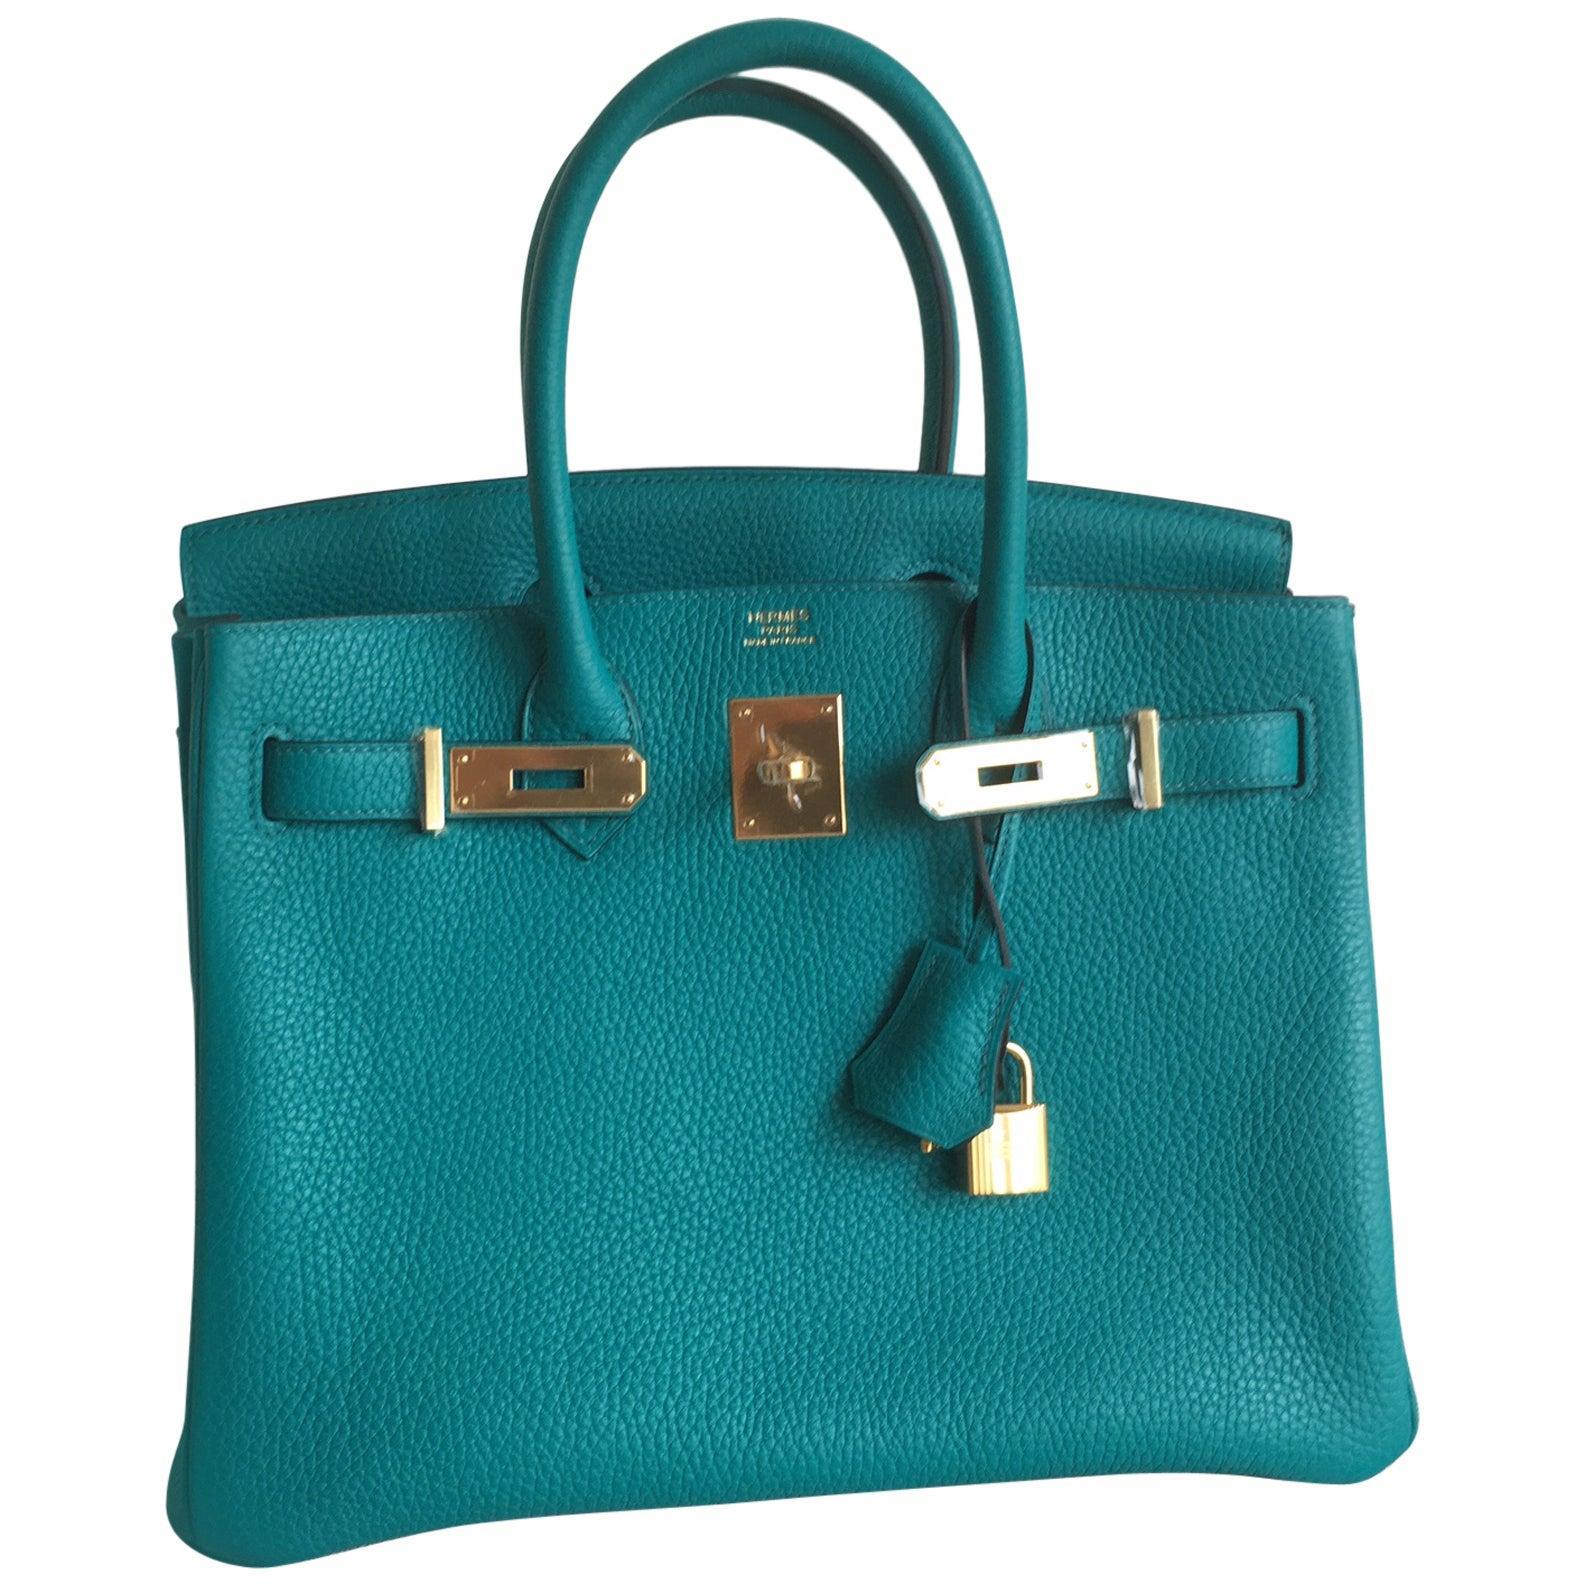 bda0faf583 Hermès Paon Blue Birkin, 30cm T. Clemence Gold Hardware at 1stdibs